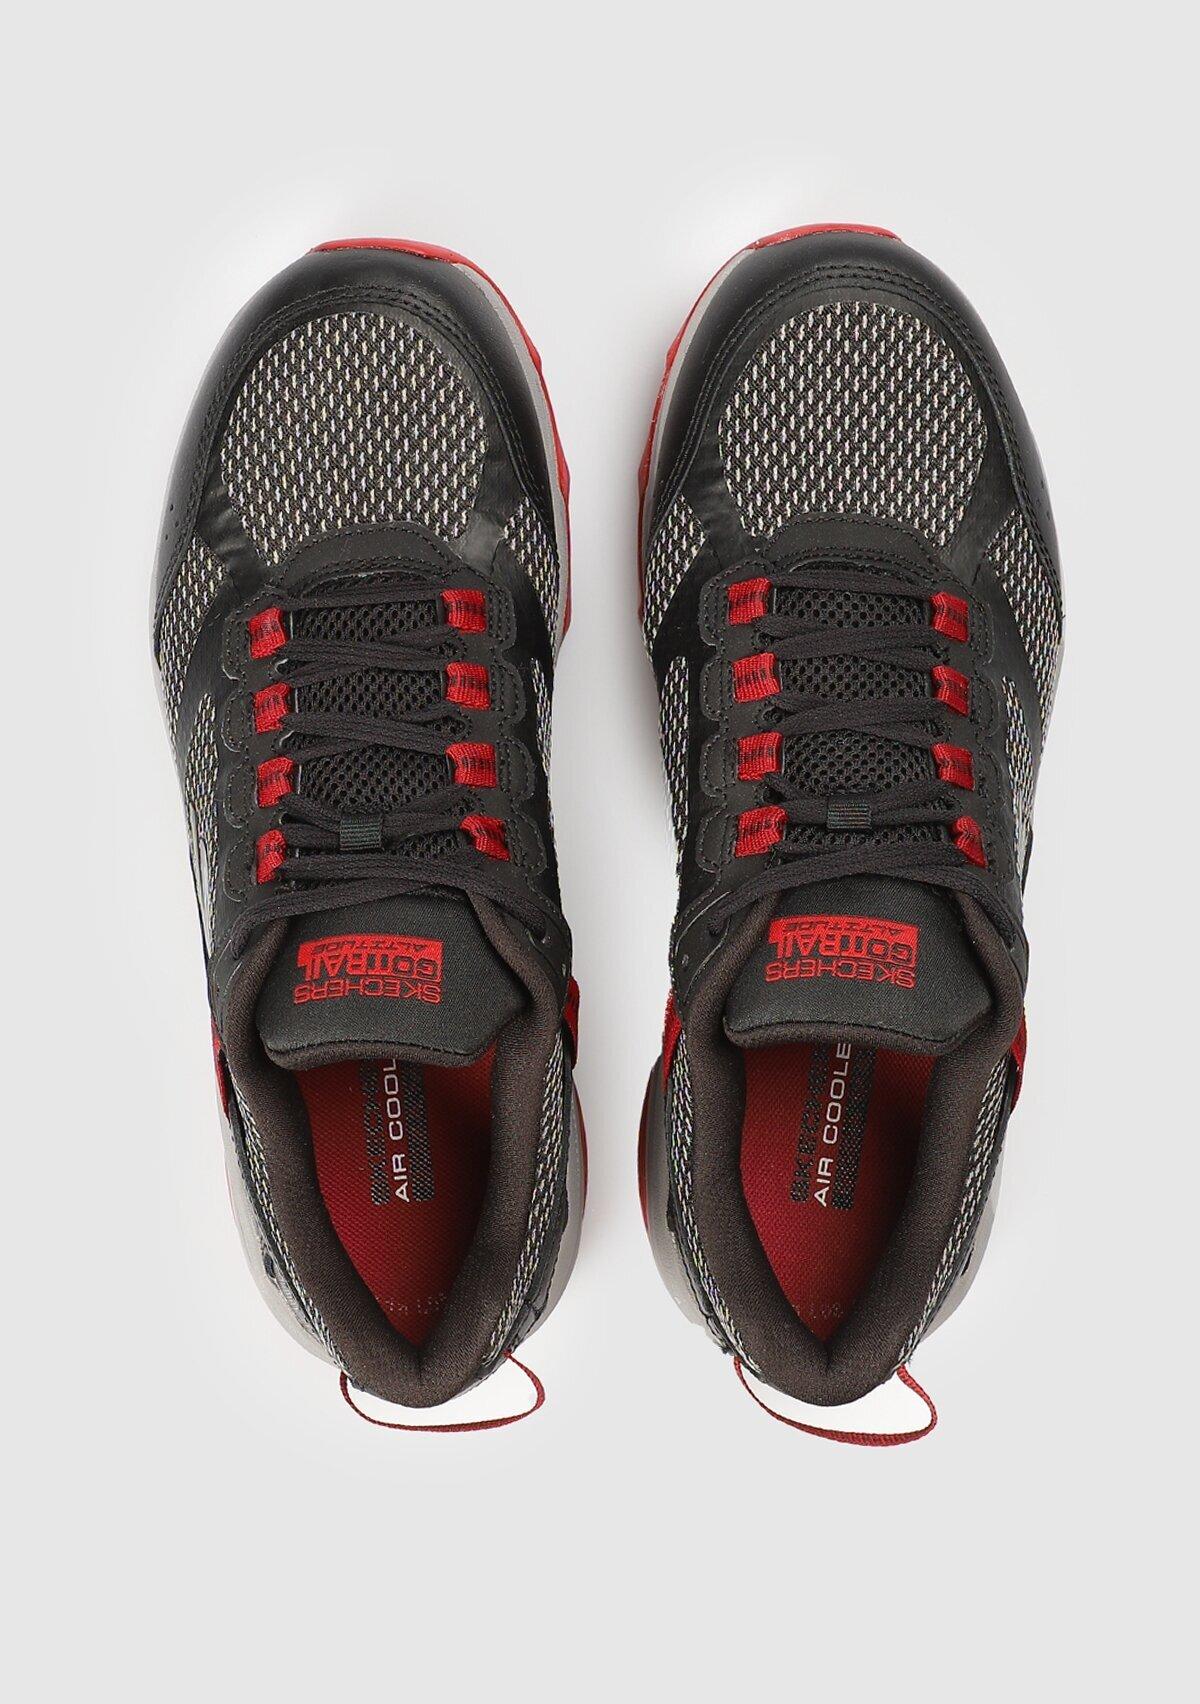 resm Go Run Trail Altitude Siyah Erkek Sneaker 220111Bkrd